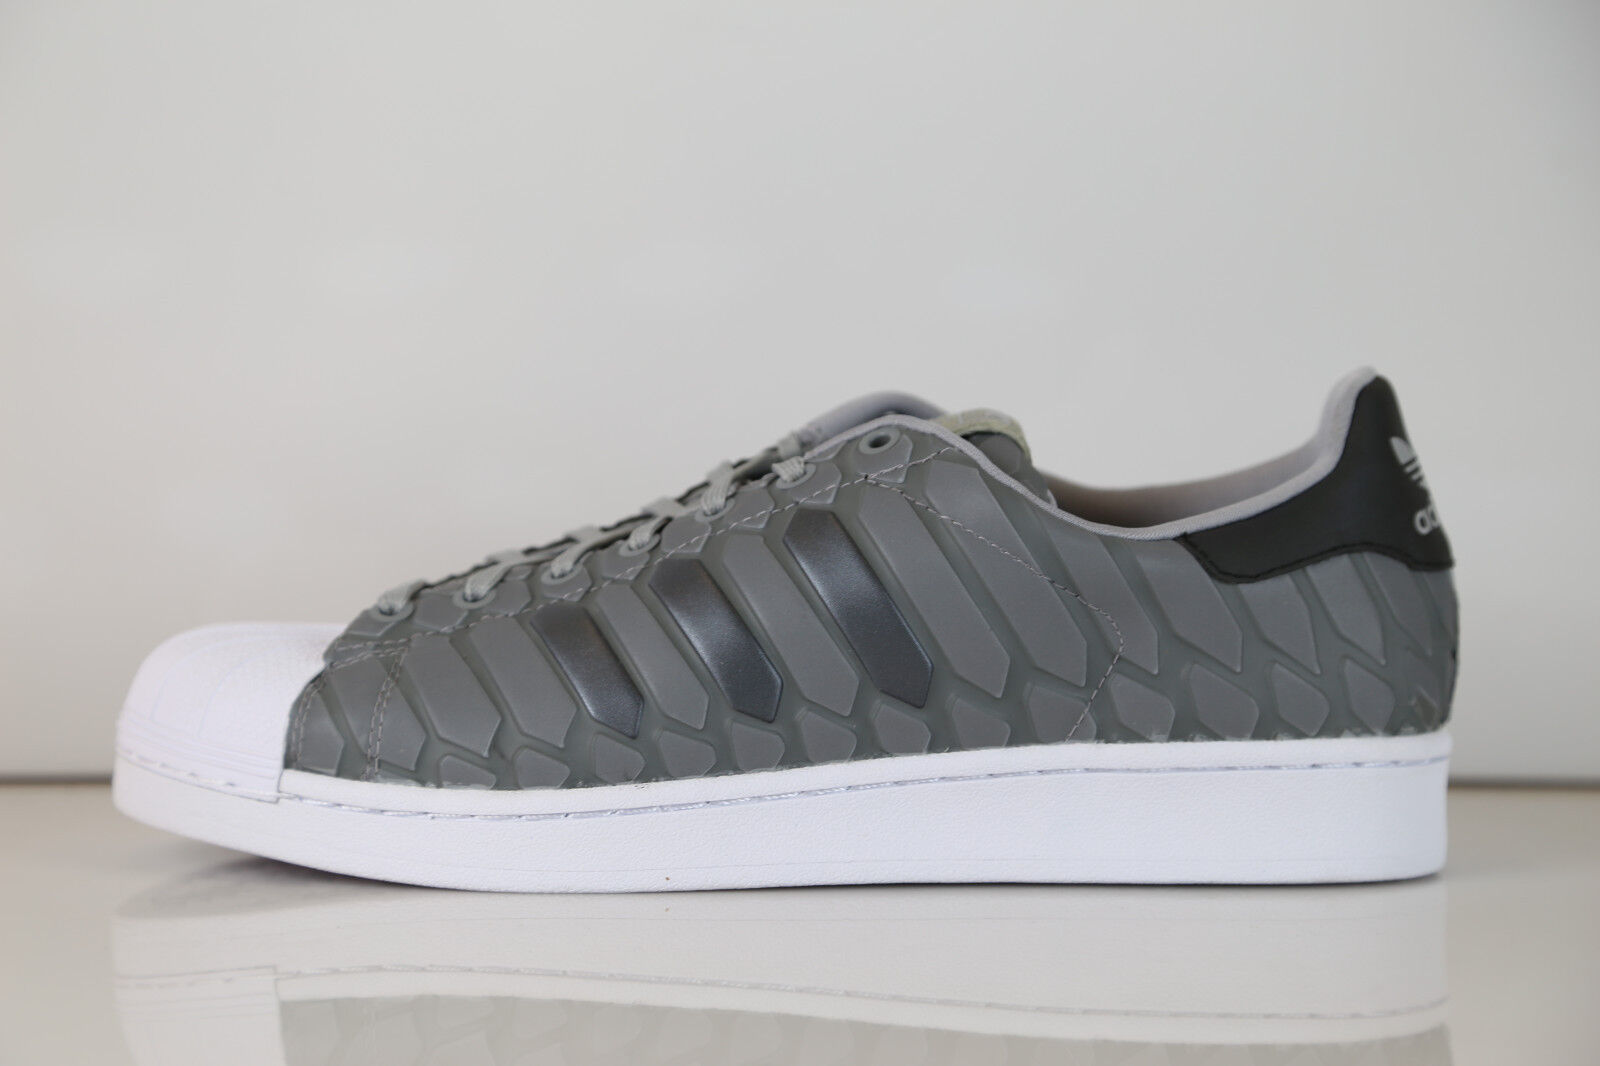 Adidas Superstar Xeno Light Onyx Grey 3M Reflective Snakeskin D69367 8-13 stan 1 Scarpe classiche da uomo